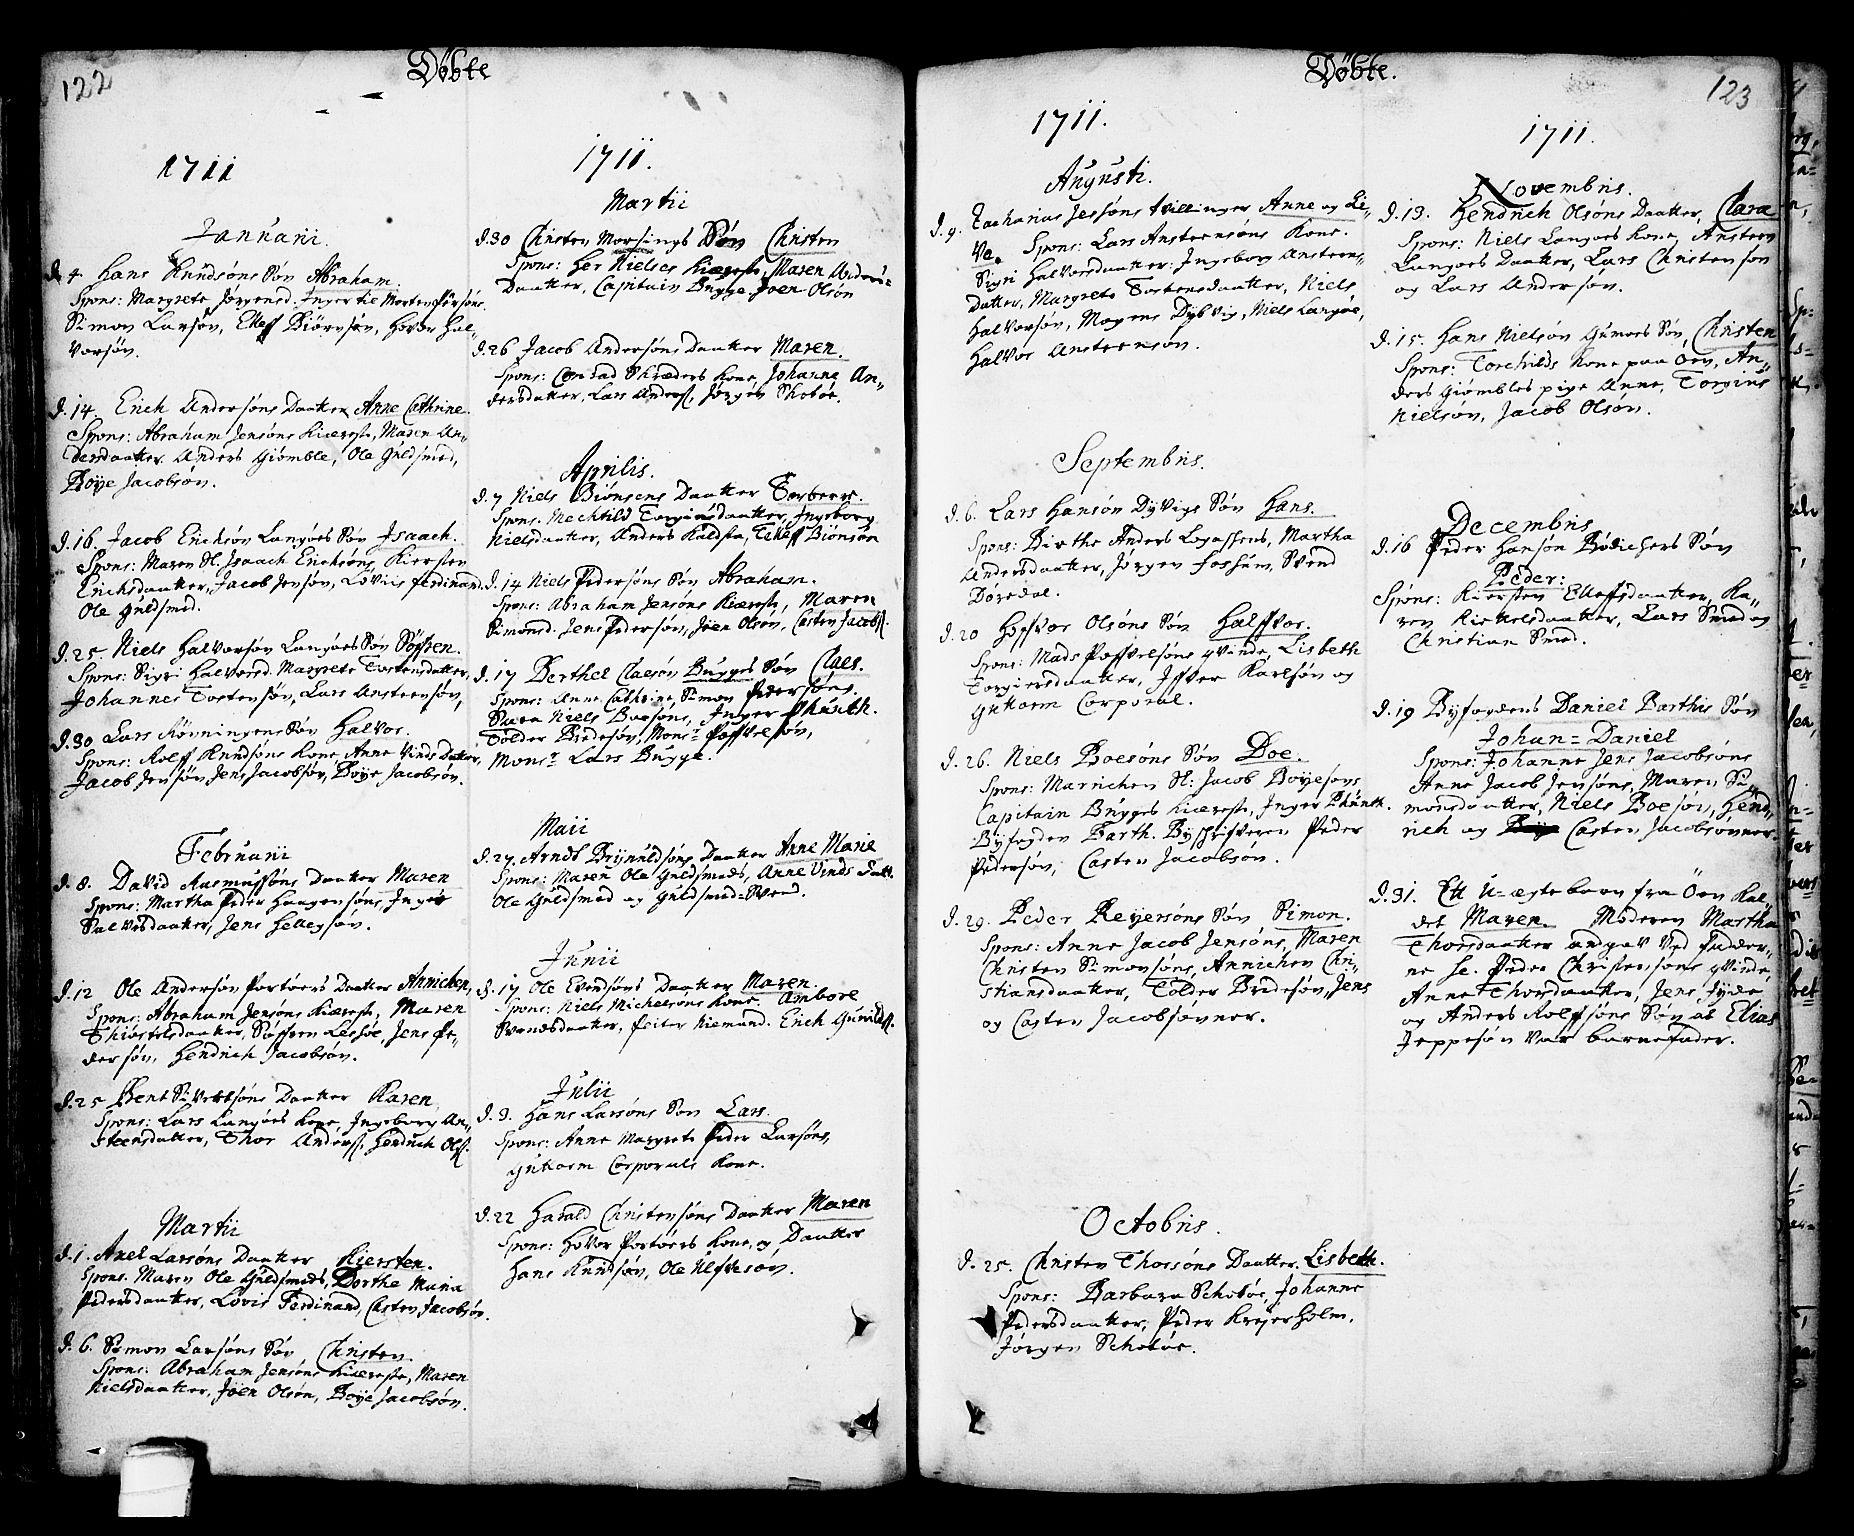 SAKO, Kragerø kirkebøker, F/Fa/L0001: Ministerialbok nr. 1, 1702-1766, s. 122-123